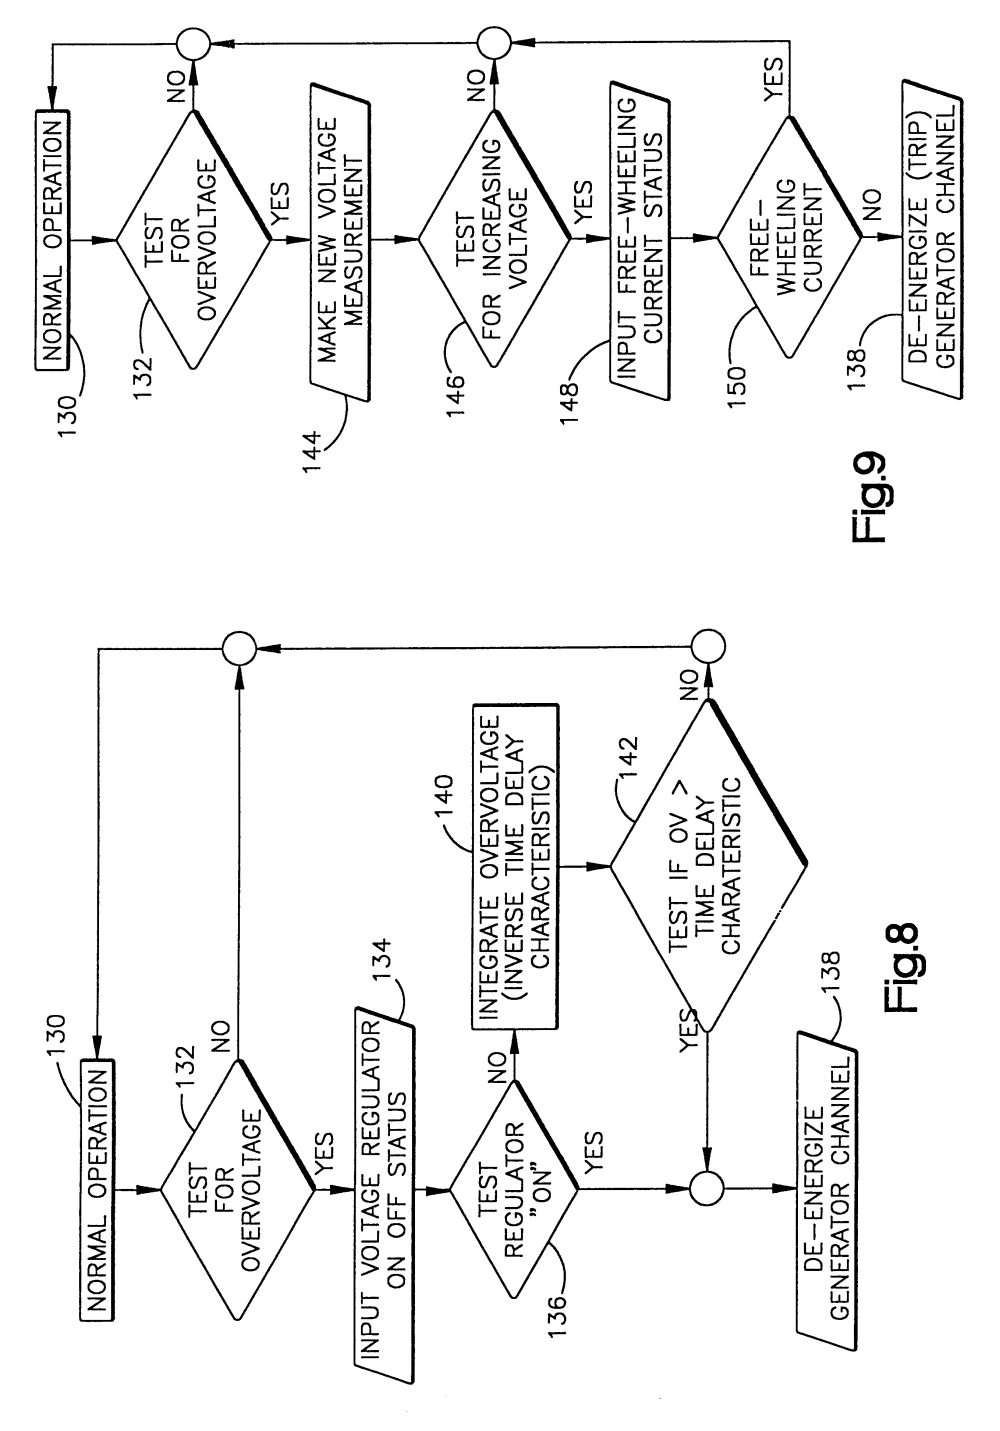 medium resolution of onan generator 6 5 nh remote wiring diagram